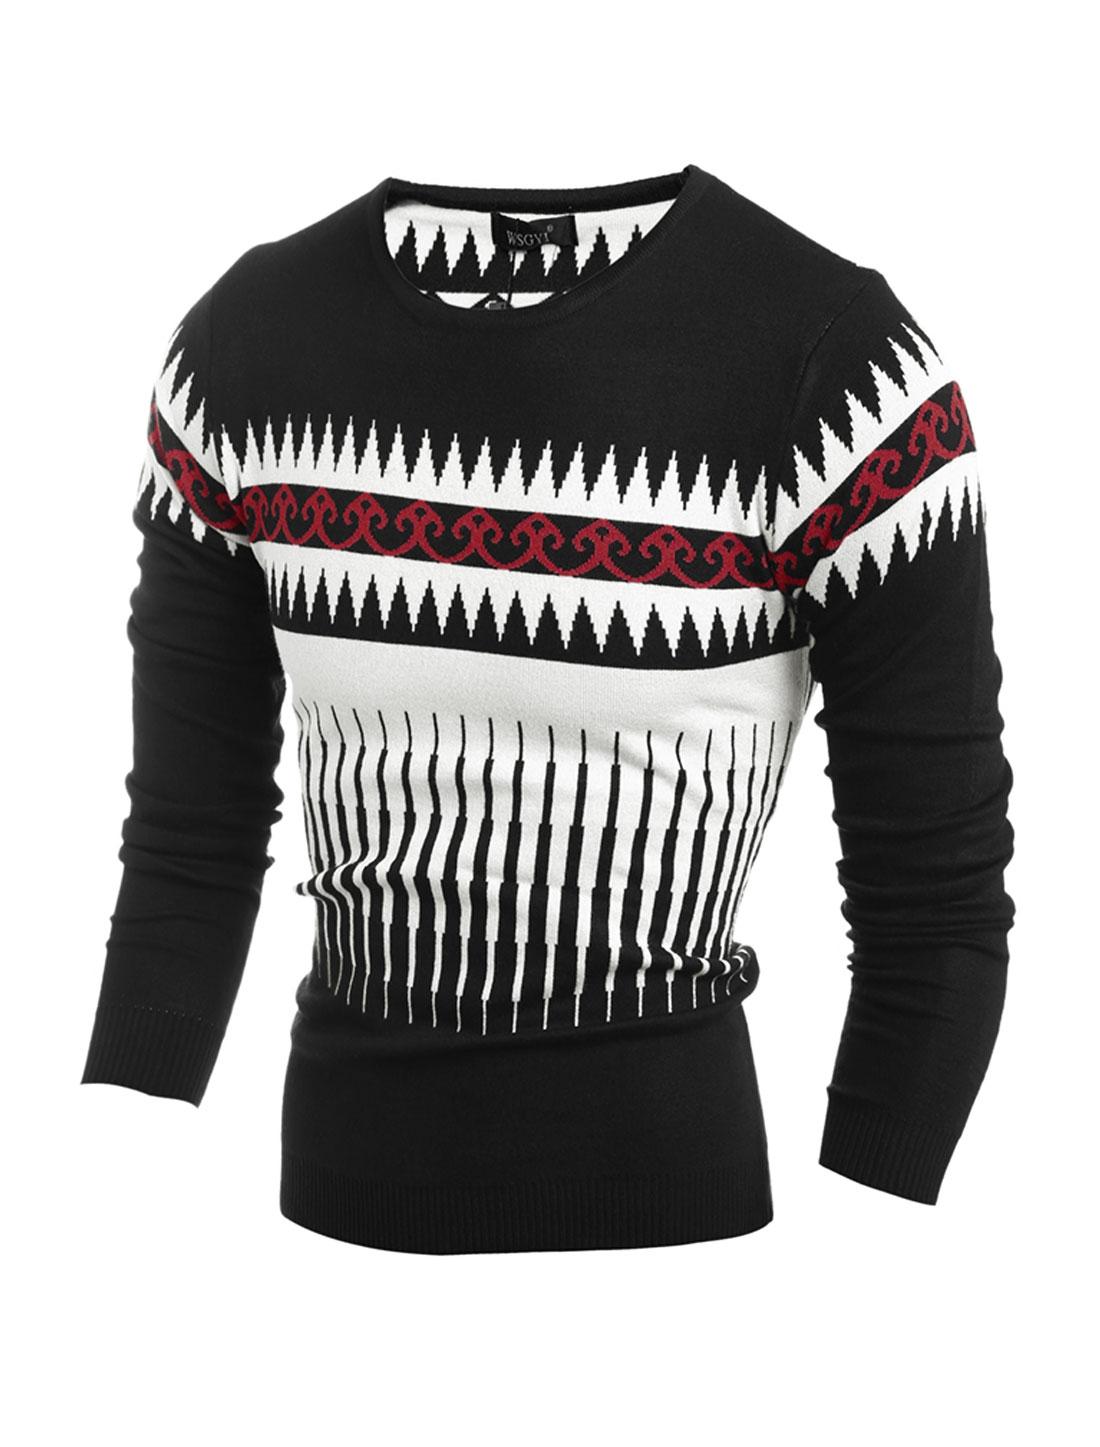 Men Crew Neck Geometric Novelty Slim Fit Knit Shirt Black M